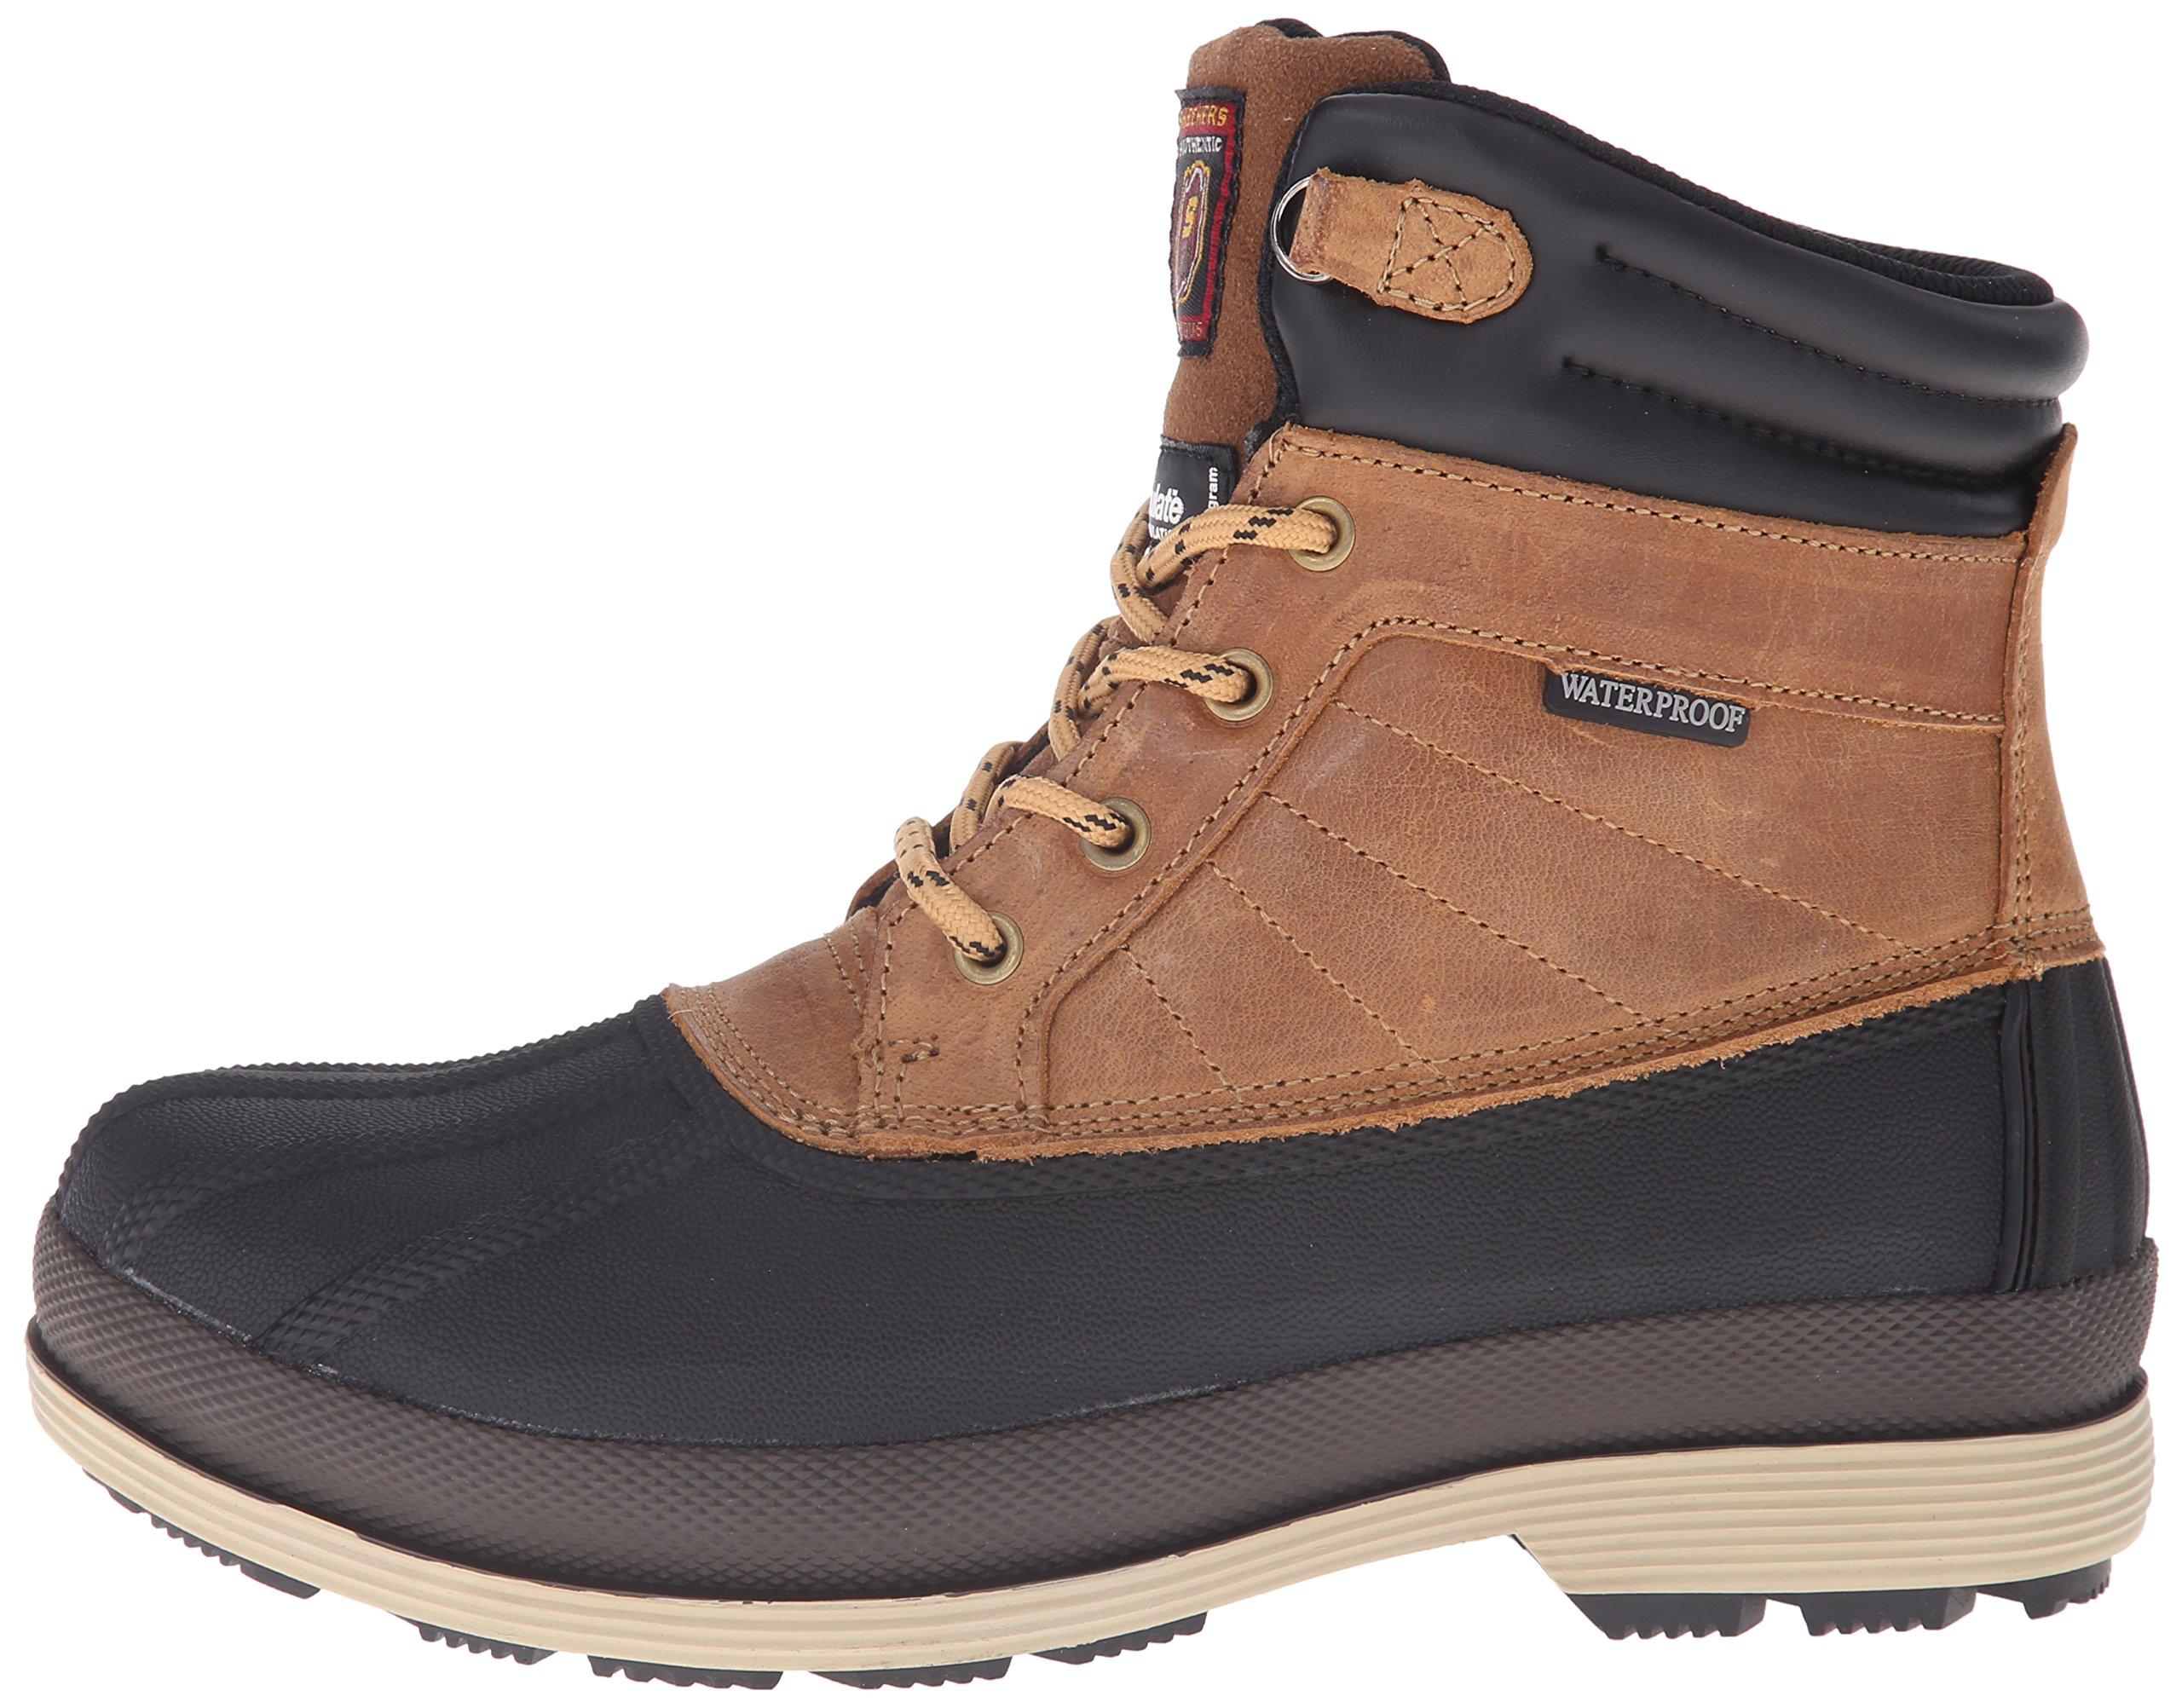 Skechers for Work Women's Duck Rain Boot, Brown, 5.5 M US by Skechers (Image #5)